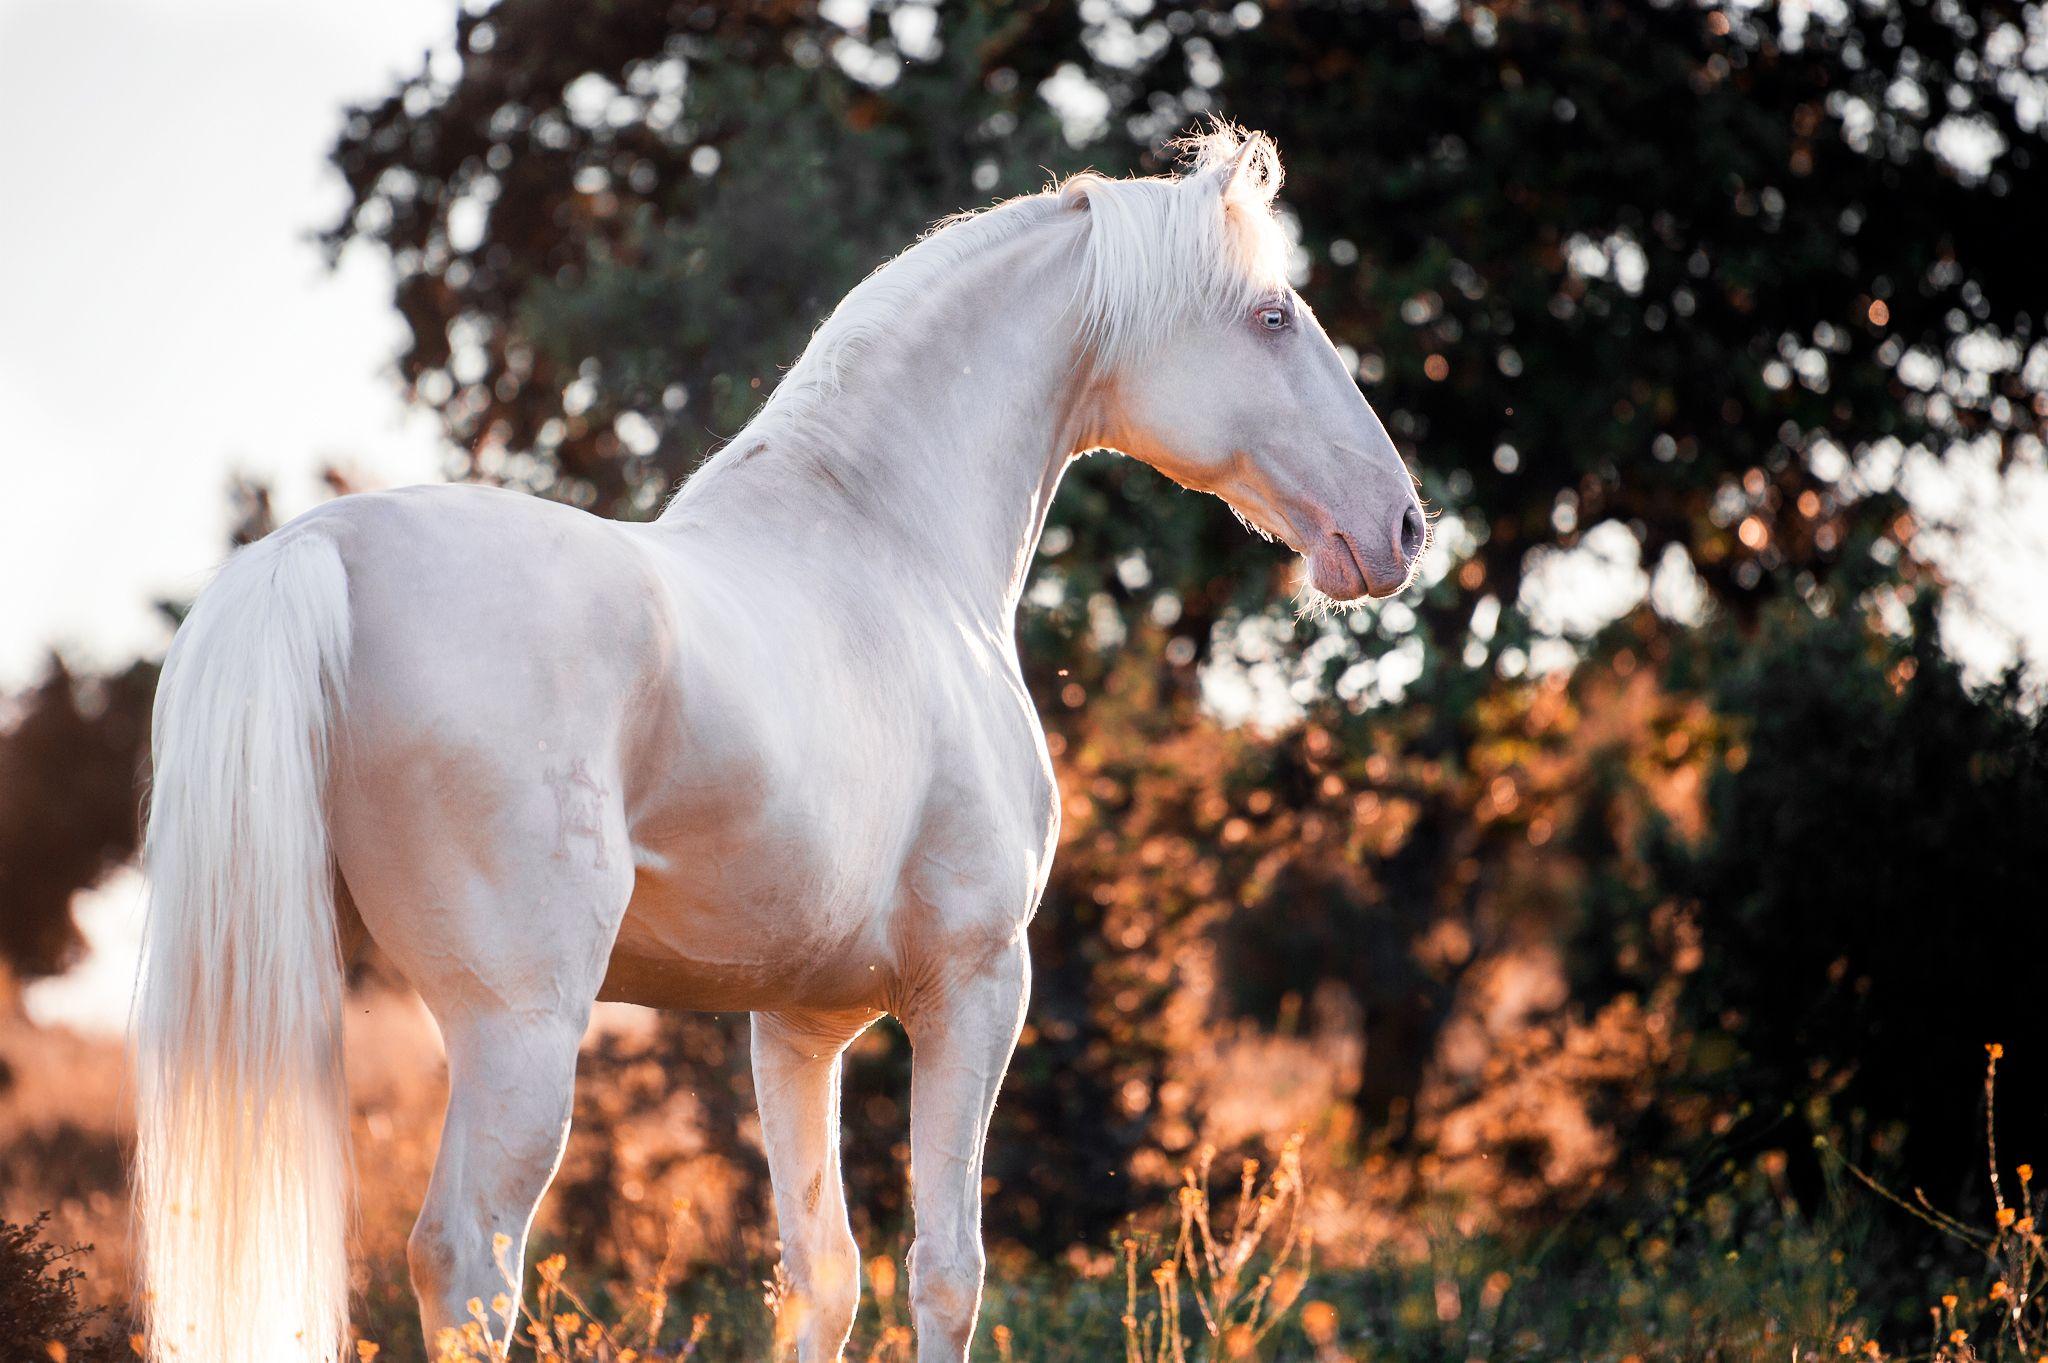 Fotos Pferde In Der Natur I Pferde Pferde Tapete Pferde Fotografie